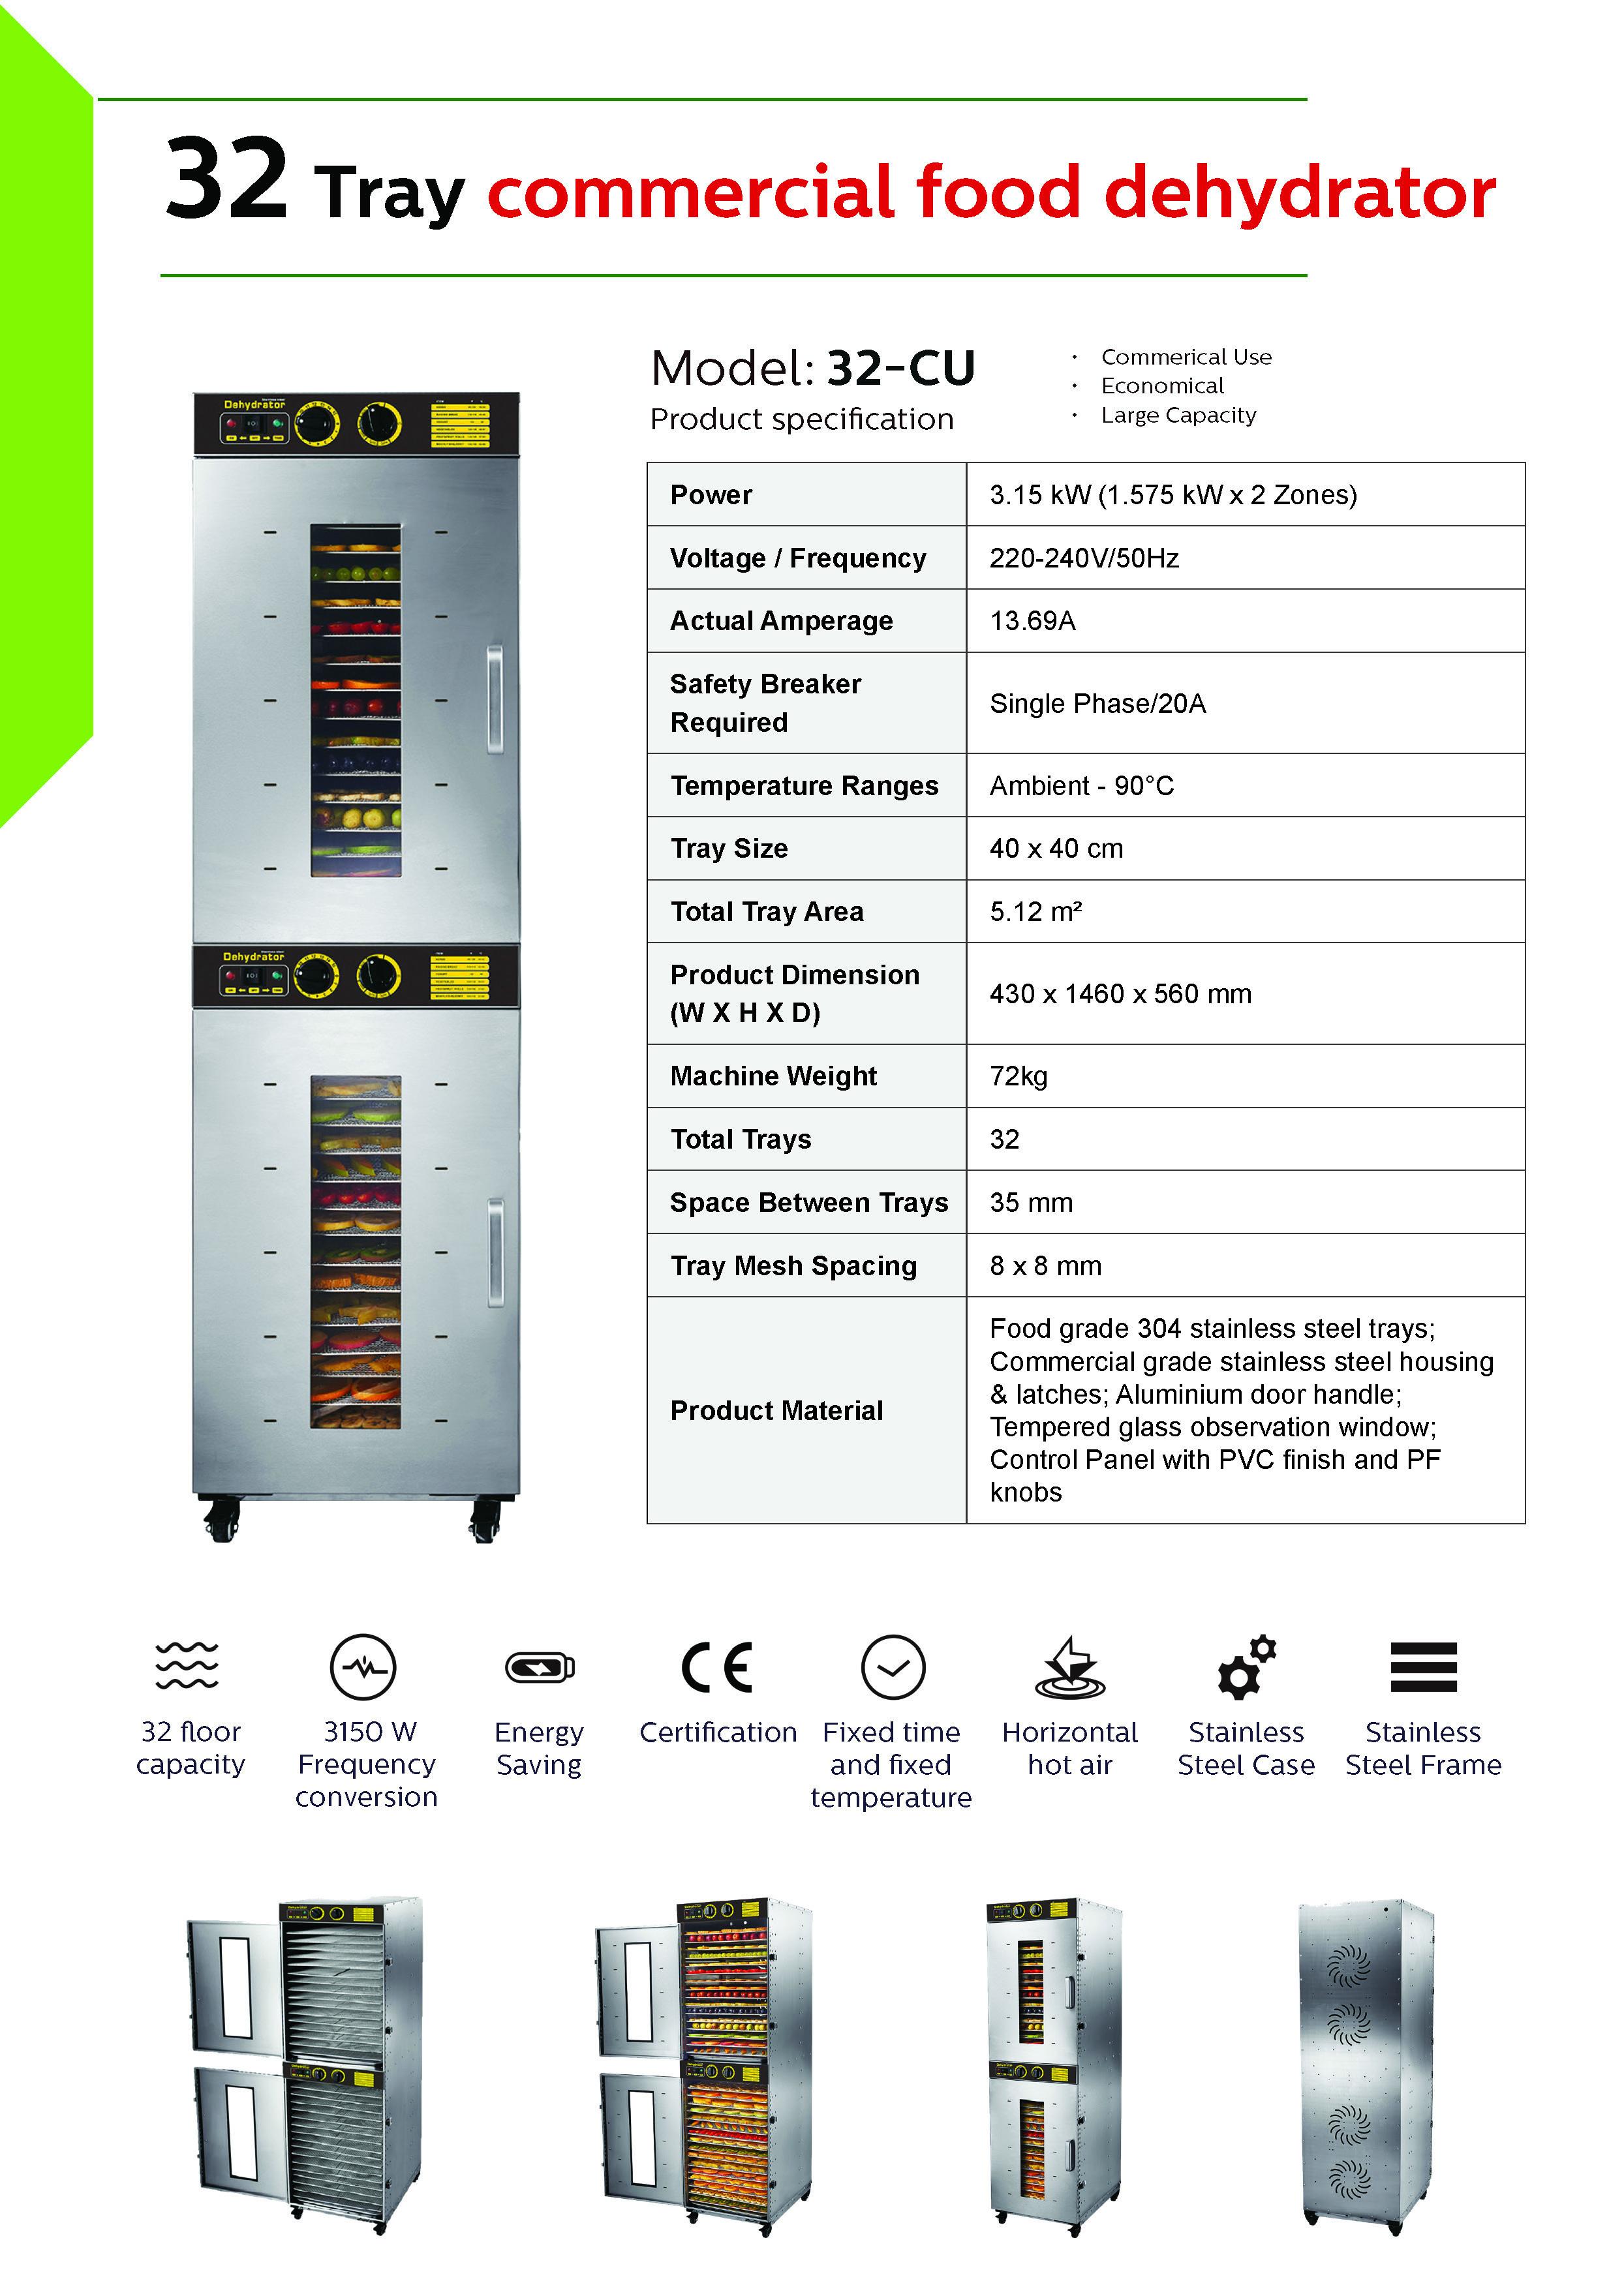 Bench Foods 32-CU Premium Commercial Food Dehydrator